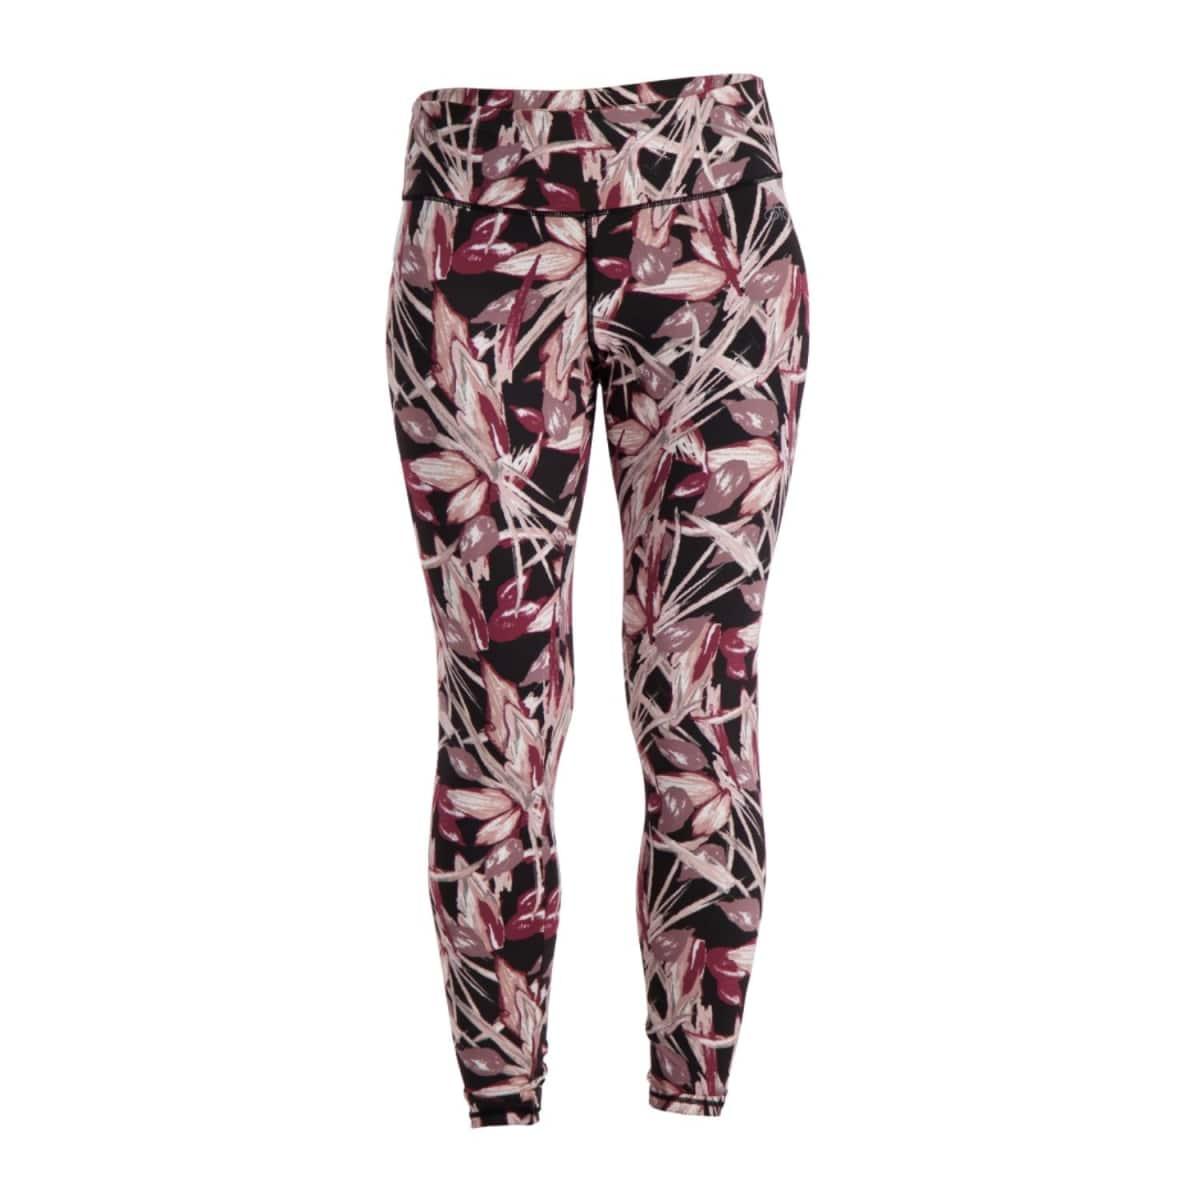 Women Sportsmans Warehouse Torch Tunik Burgundy Maroon Xl Otg Womens Floral Spark 7 8 Tight